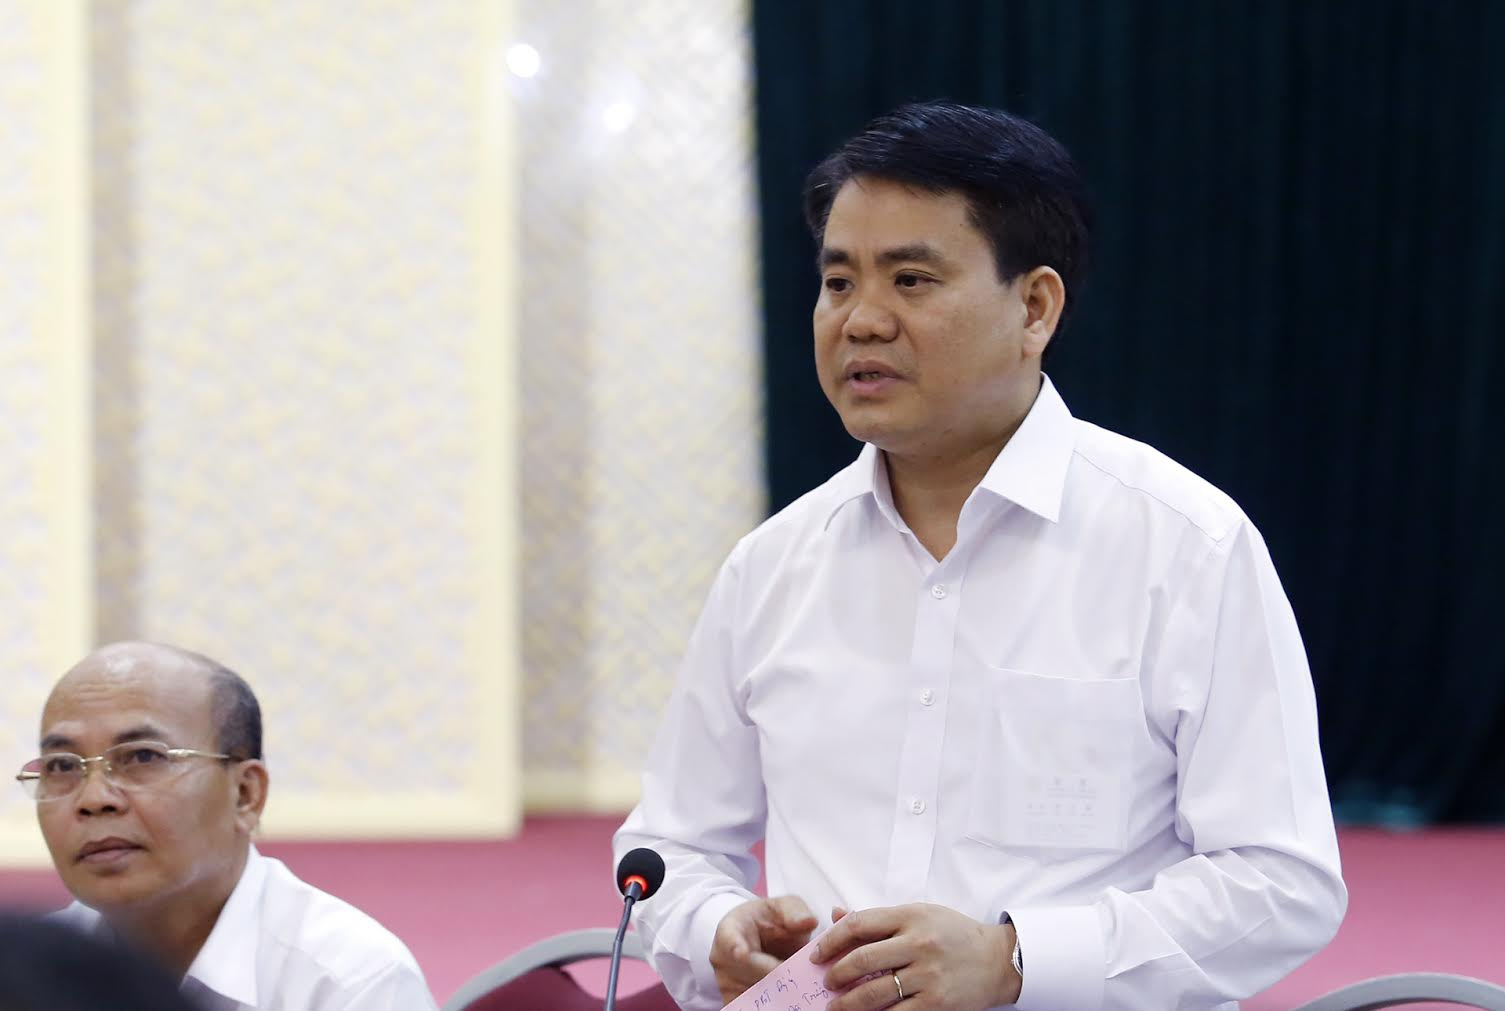 Chu tich Nguyen Duc Chung ve My Duc anh 2